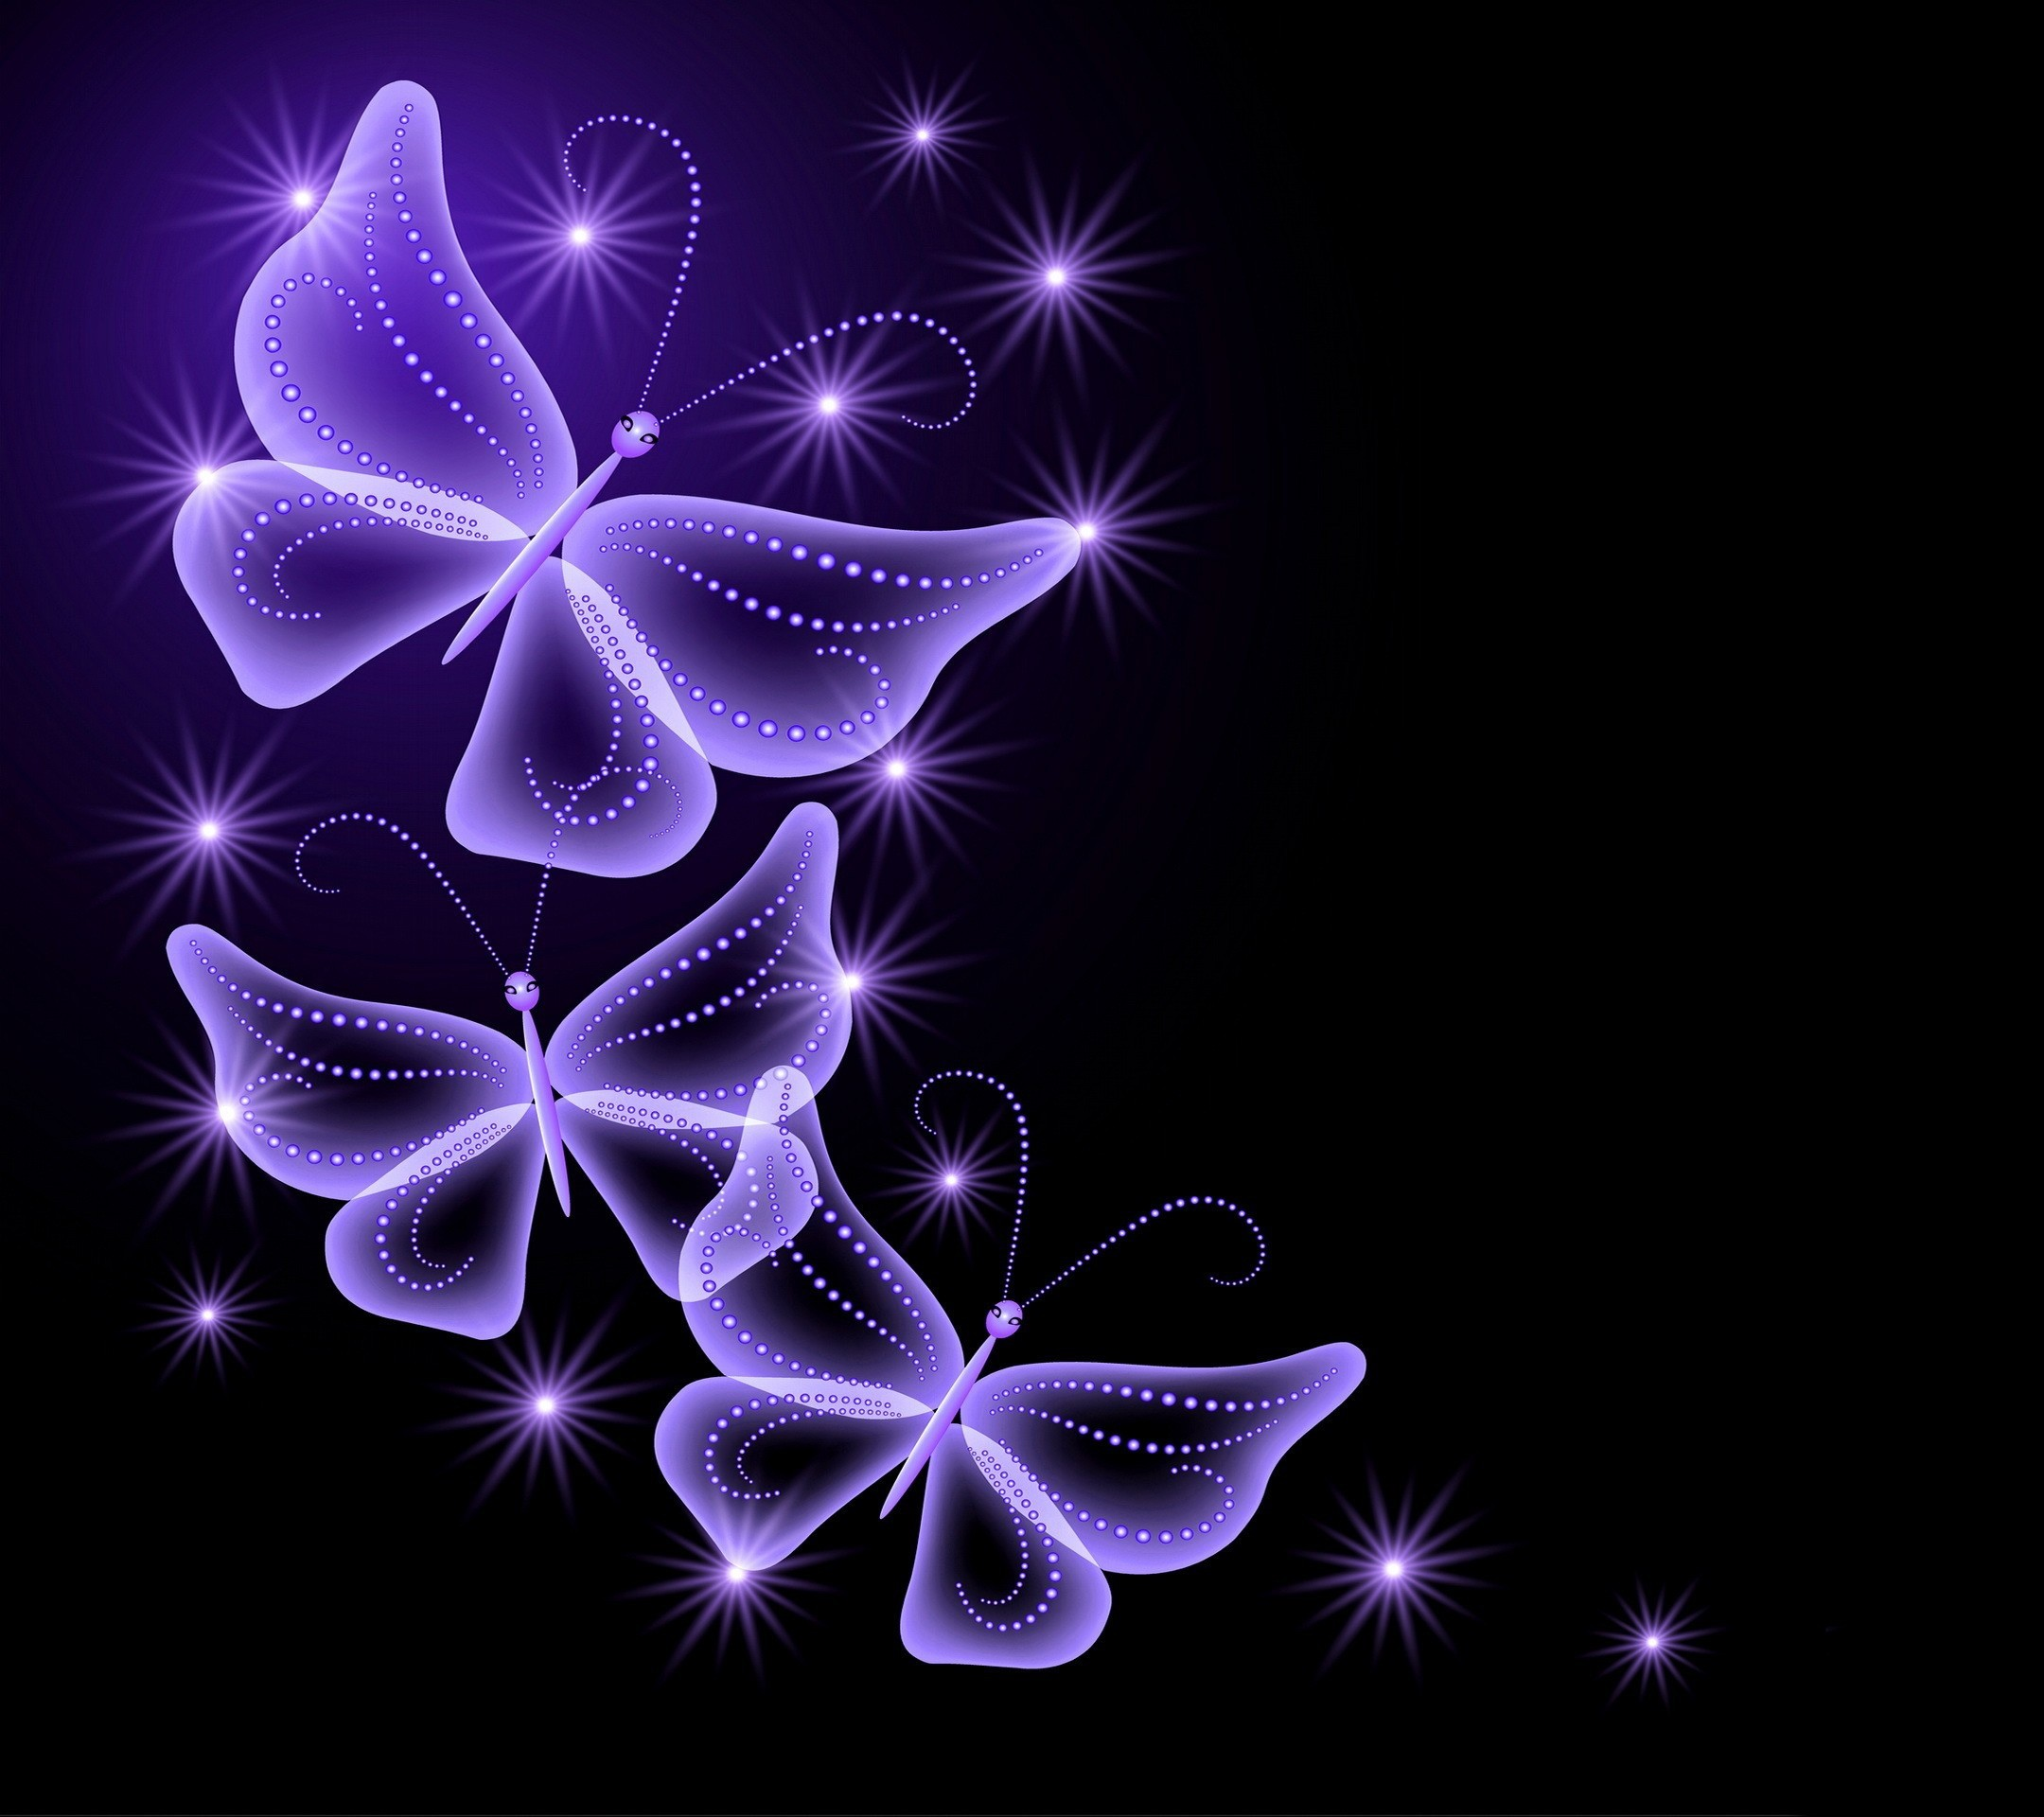 Purple Rose Background Wallpaper   Back > Wallpapers For > Purple Rose  Butterfly Background